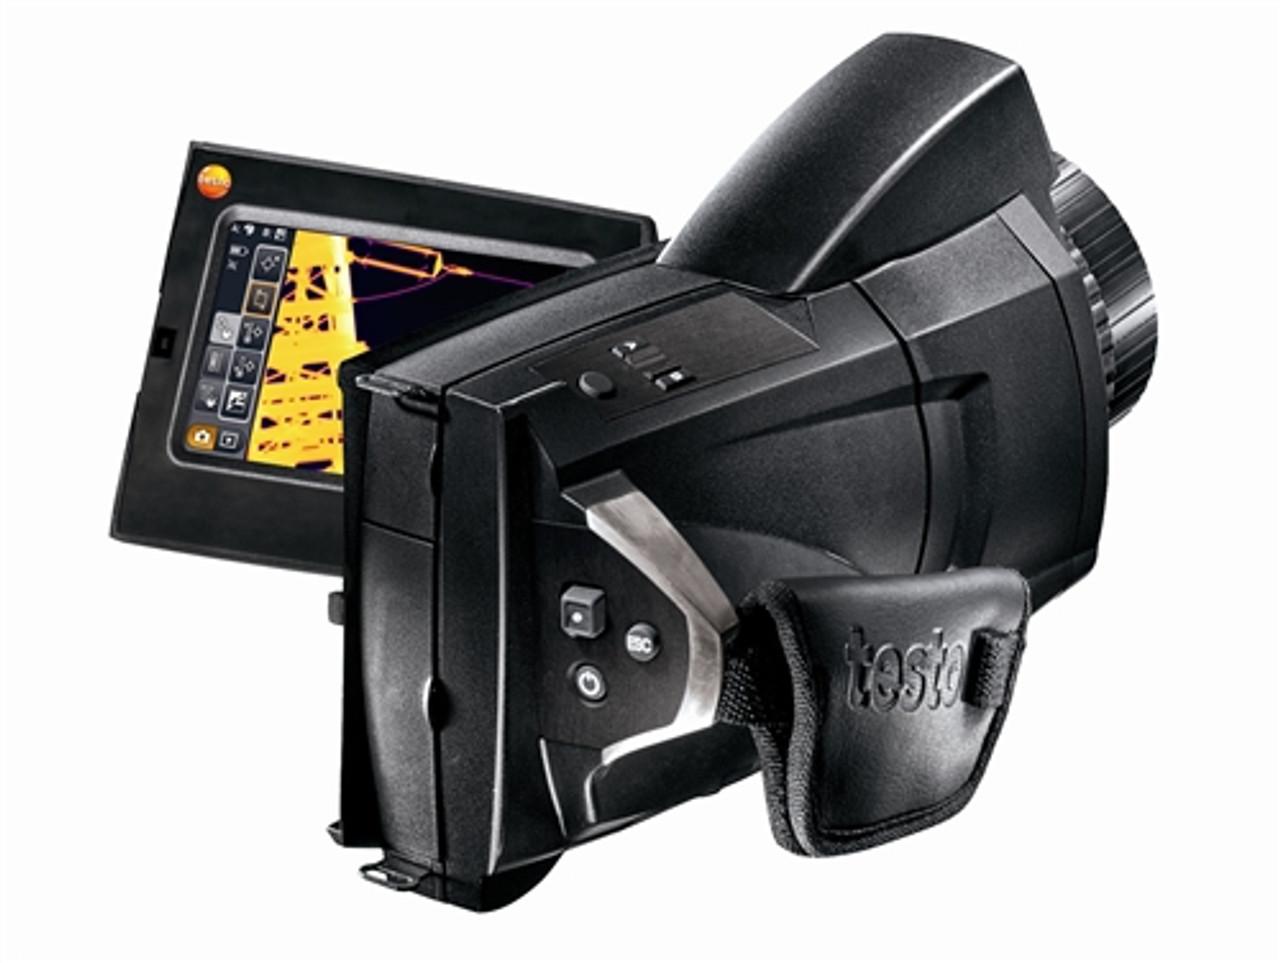 Testo 890-2 DLX Thermal Imager - FREE Level 1 IR Training!